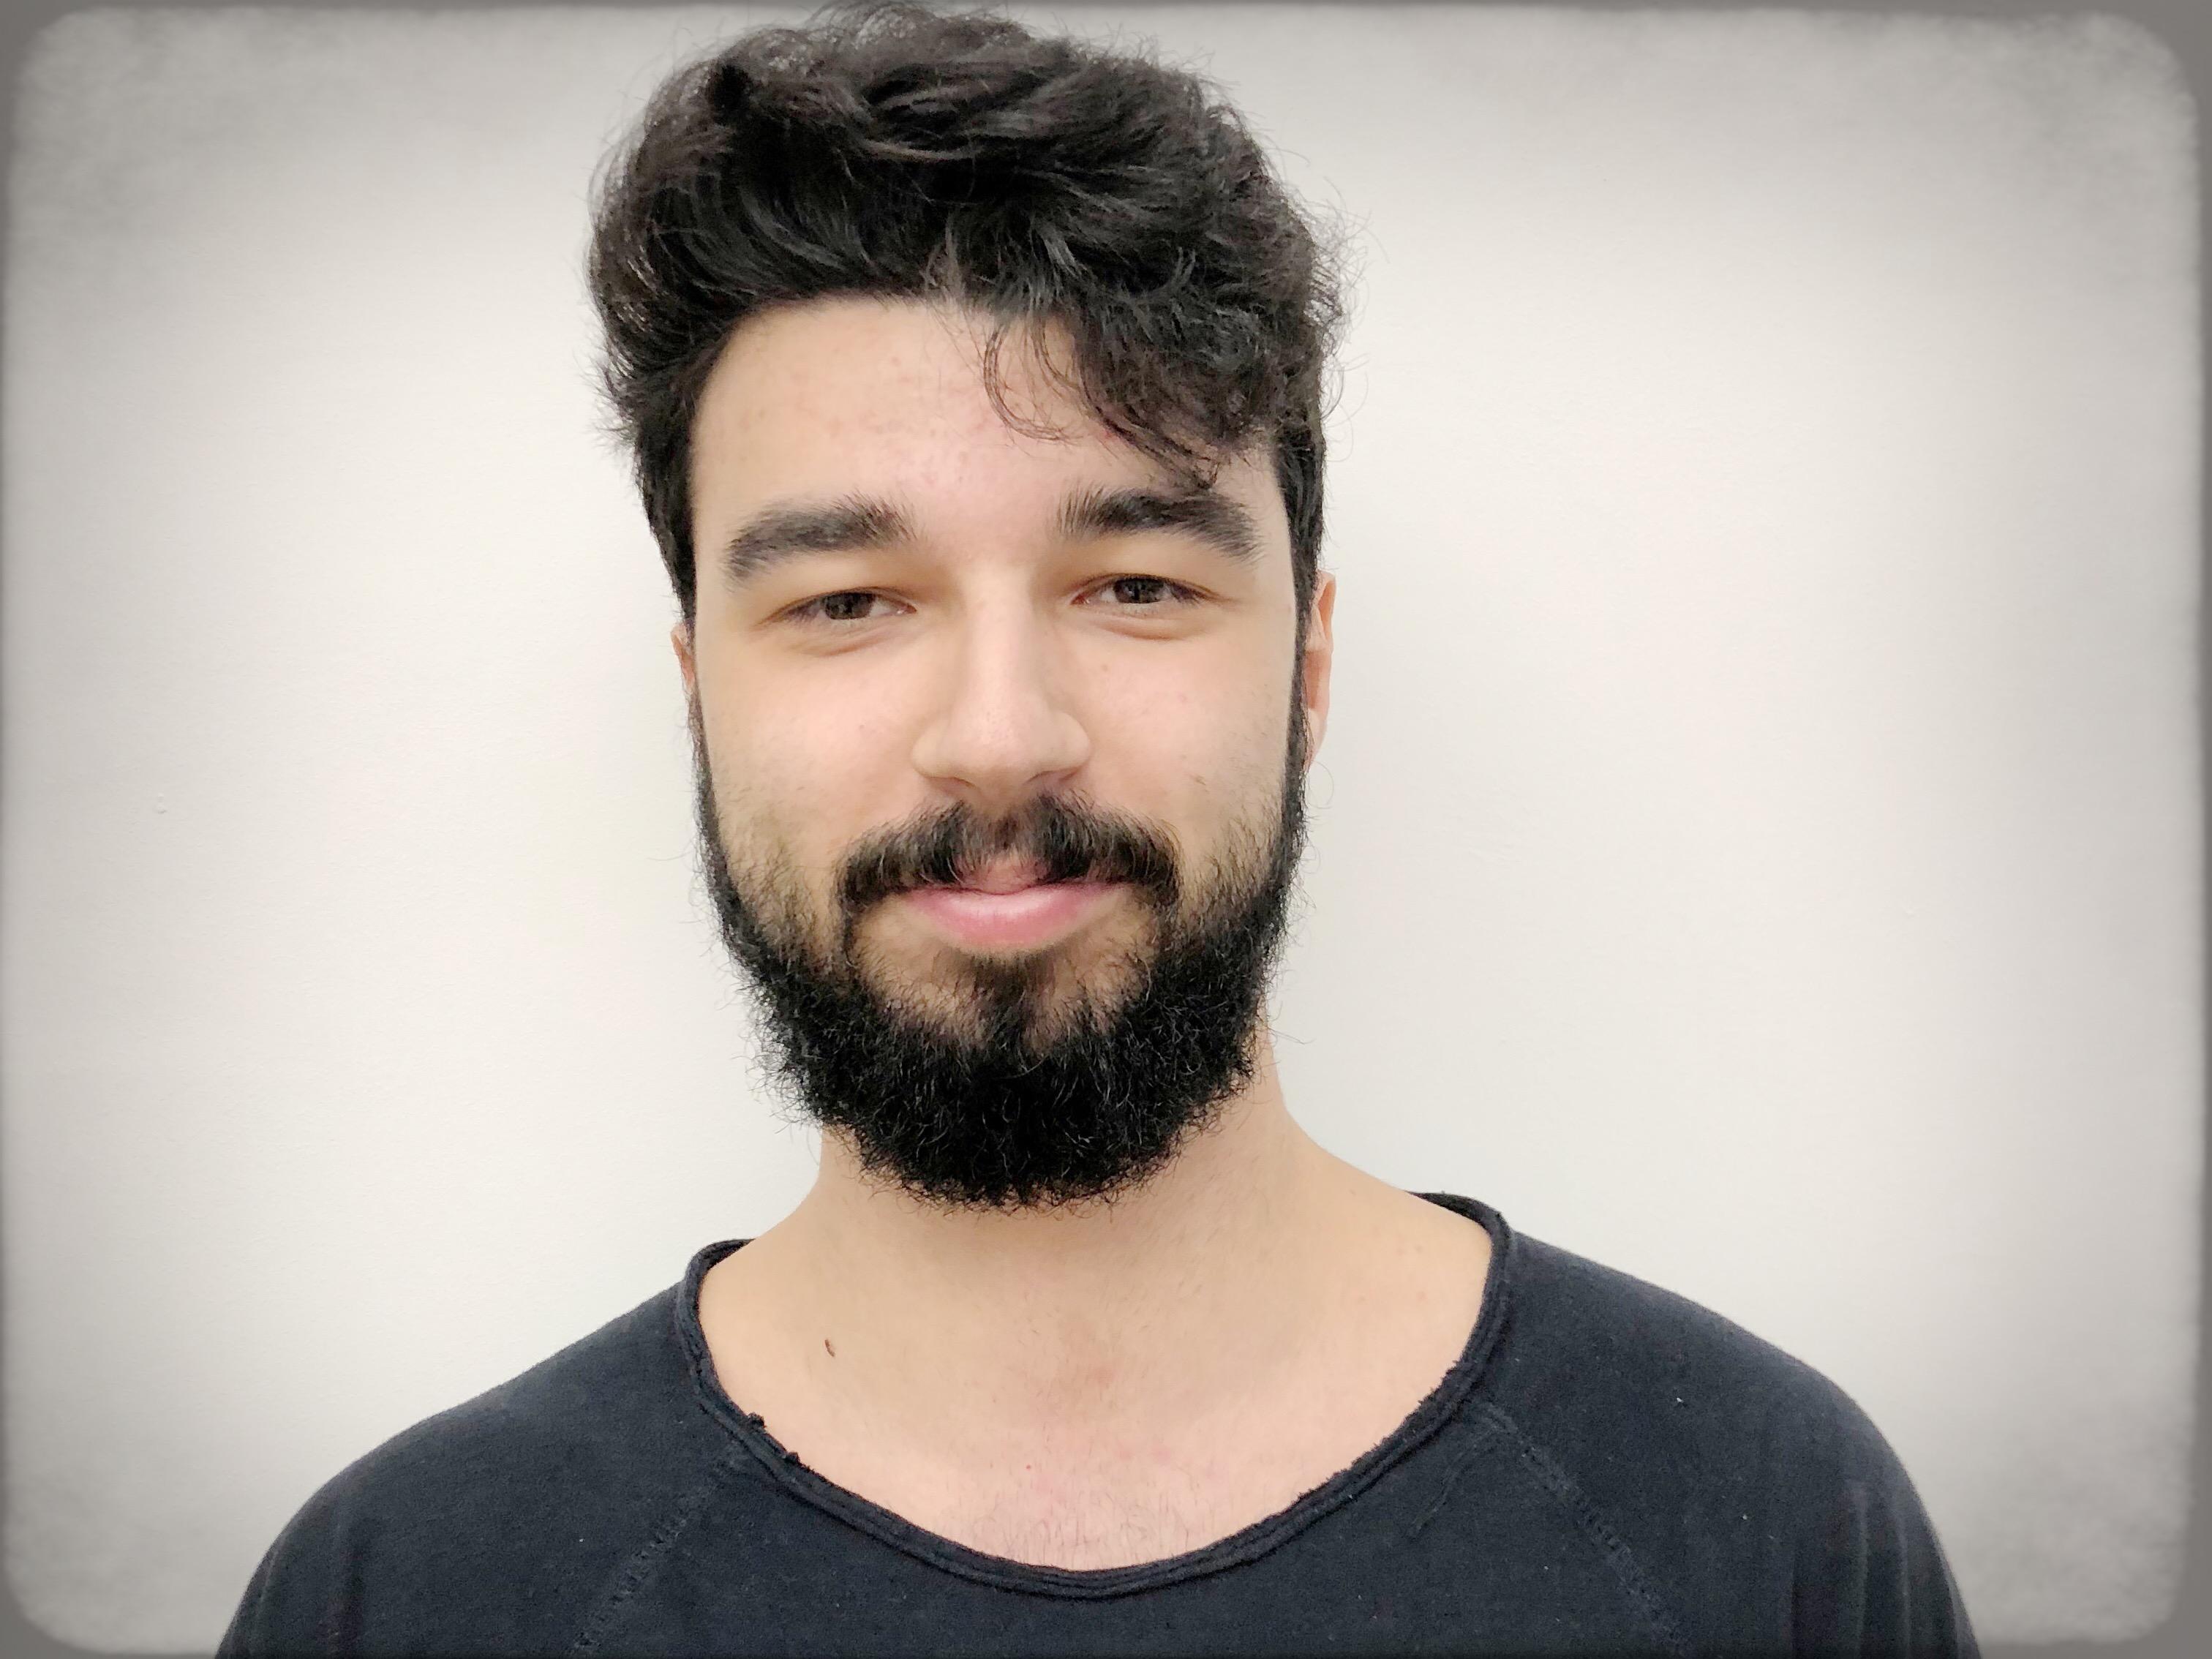 Daniel Rasheed